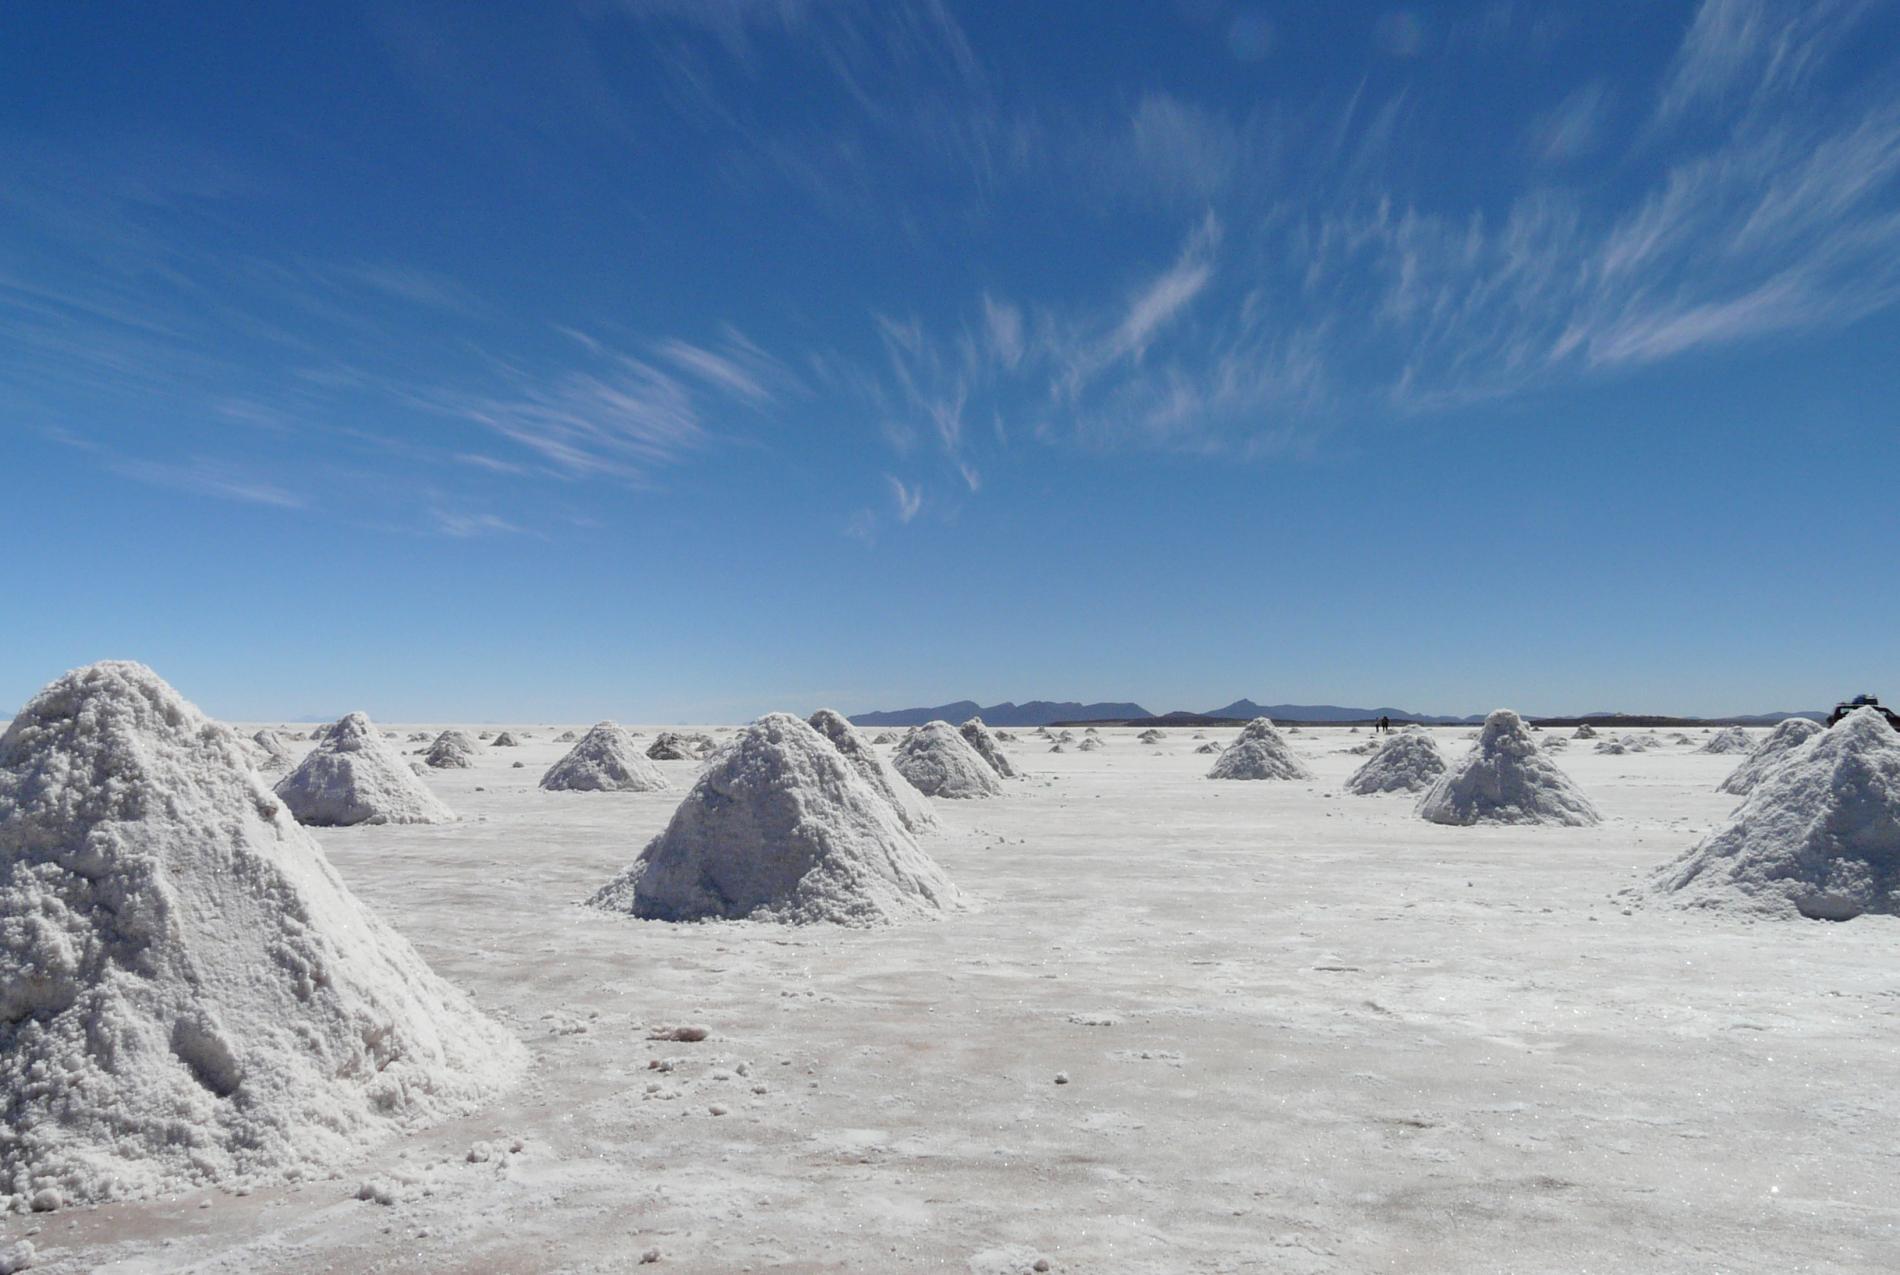 Voyage solidaire Bolivie : Vision du Monde - Photo 7